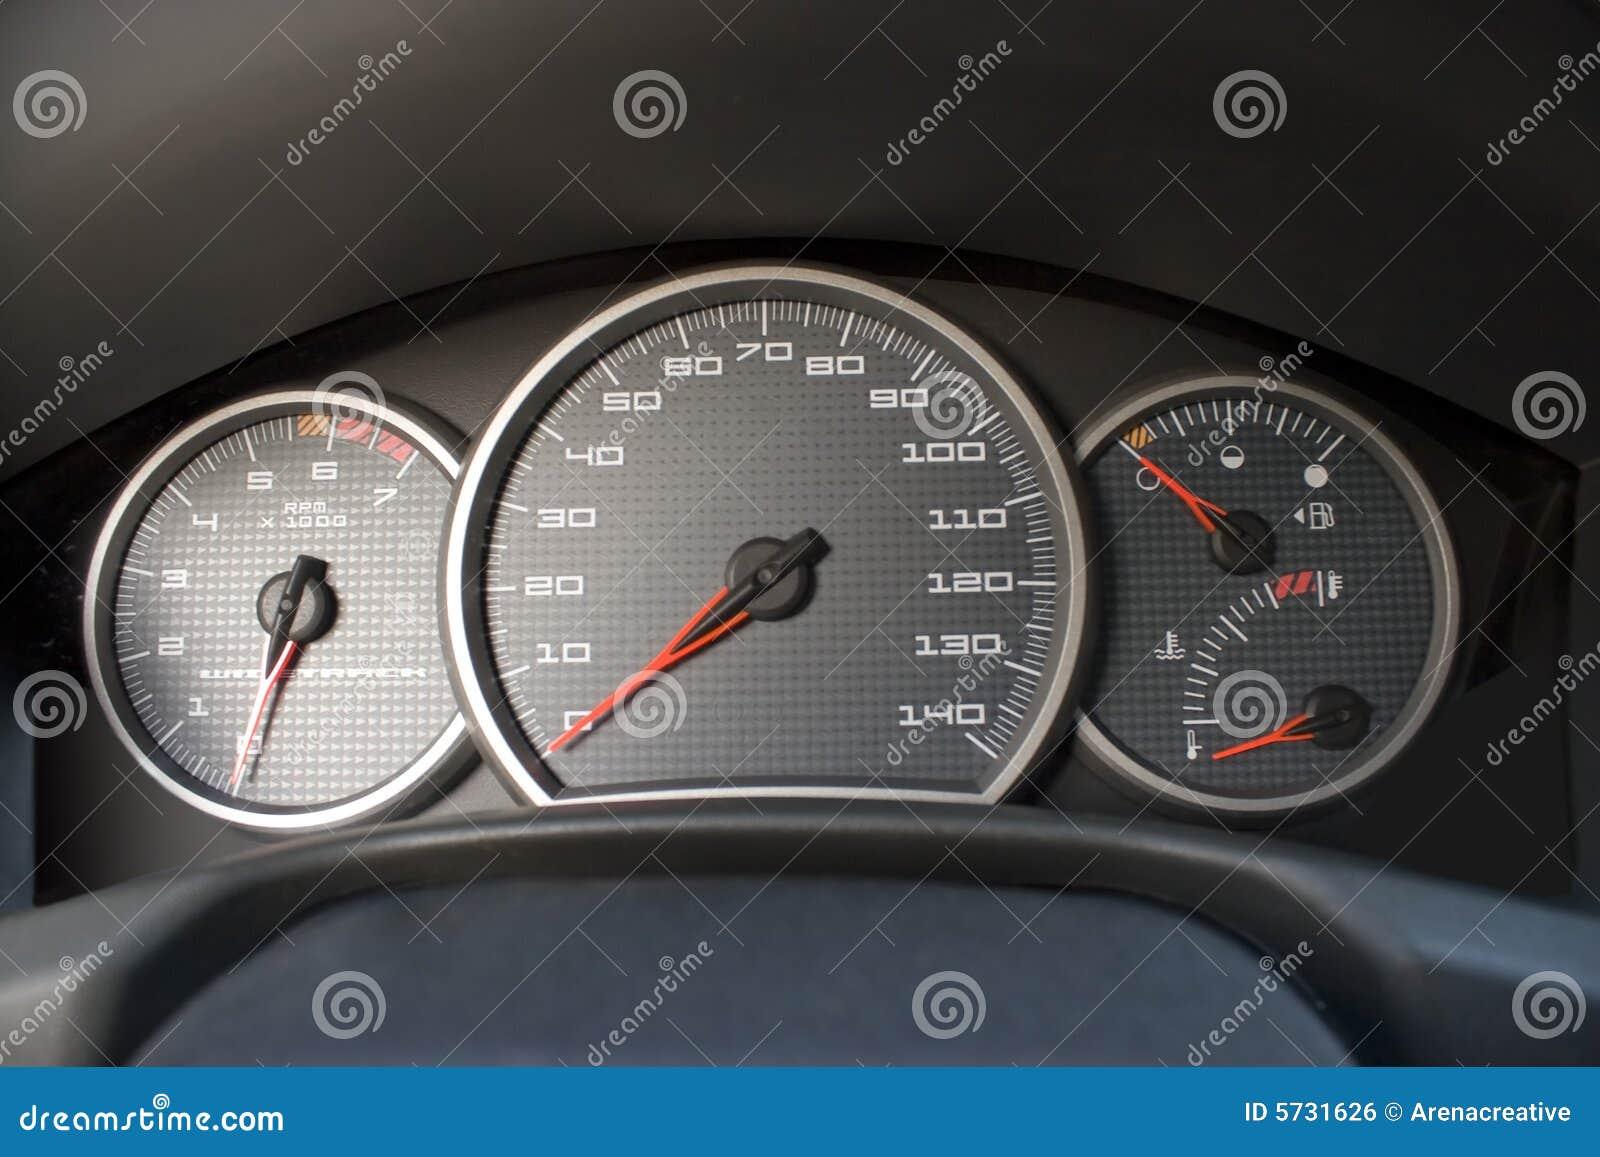 Modern Car Gauge Cluster Stock Photo Image Of Measure 5731626